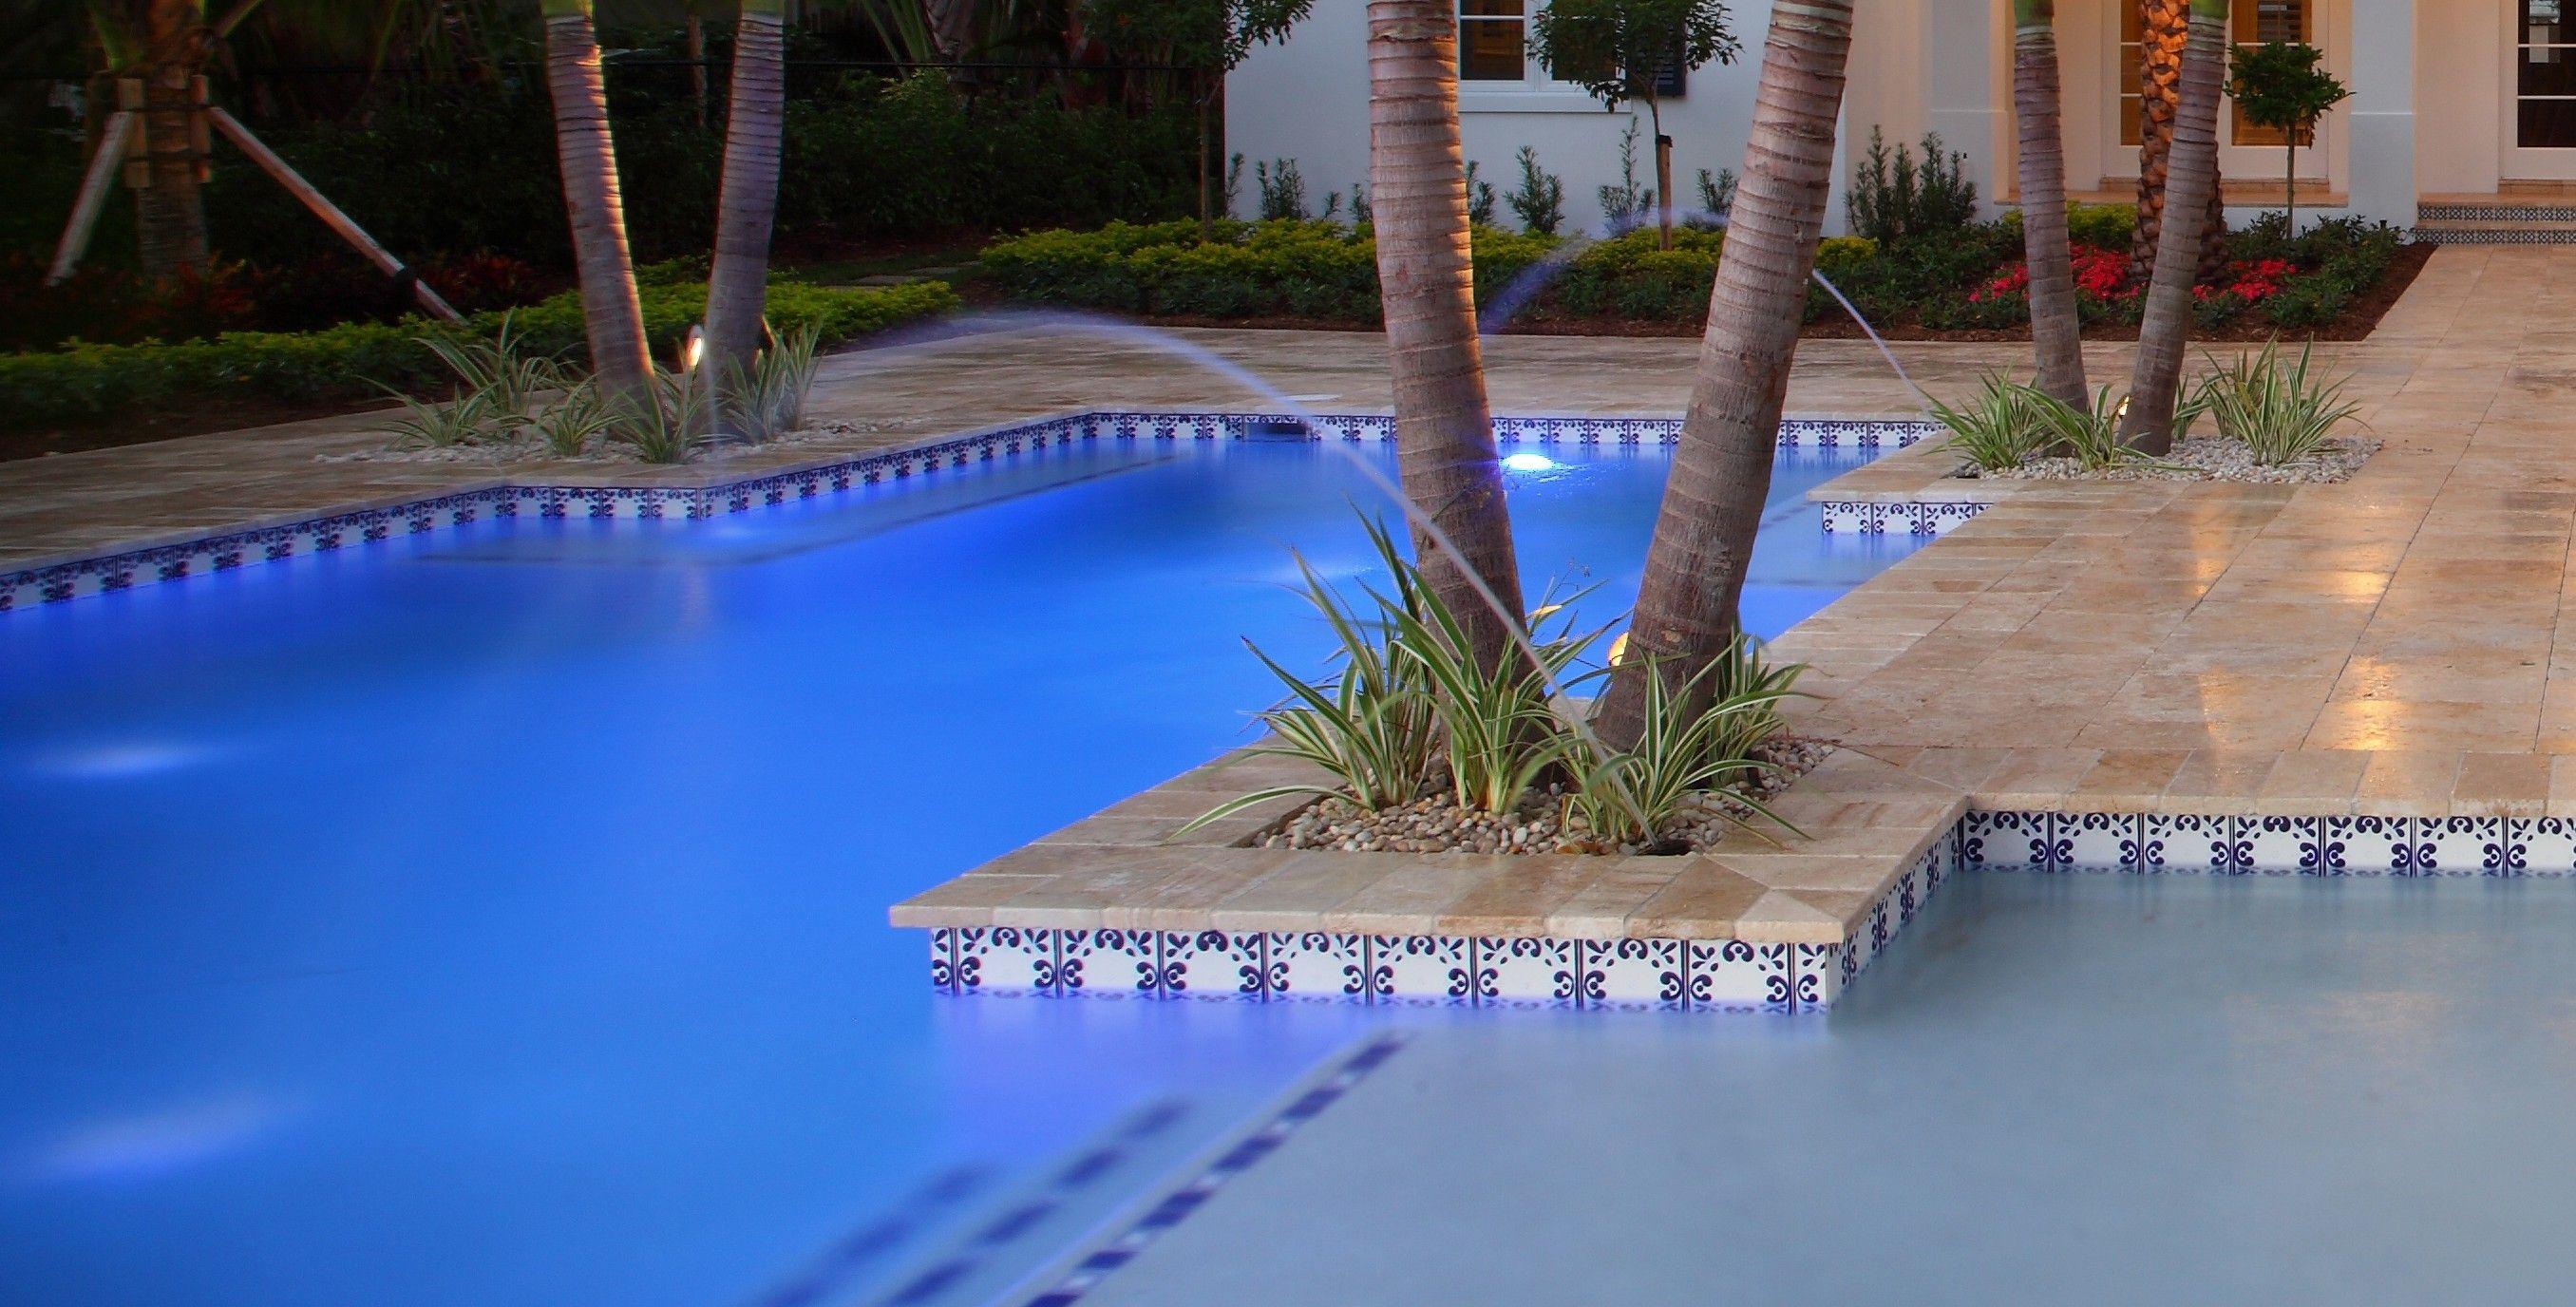 mexican pool tile & fountain design ideas for florida   pool